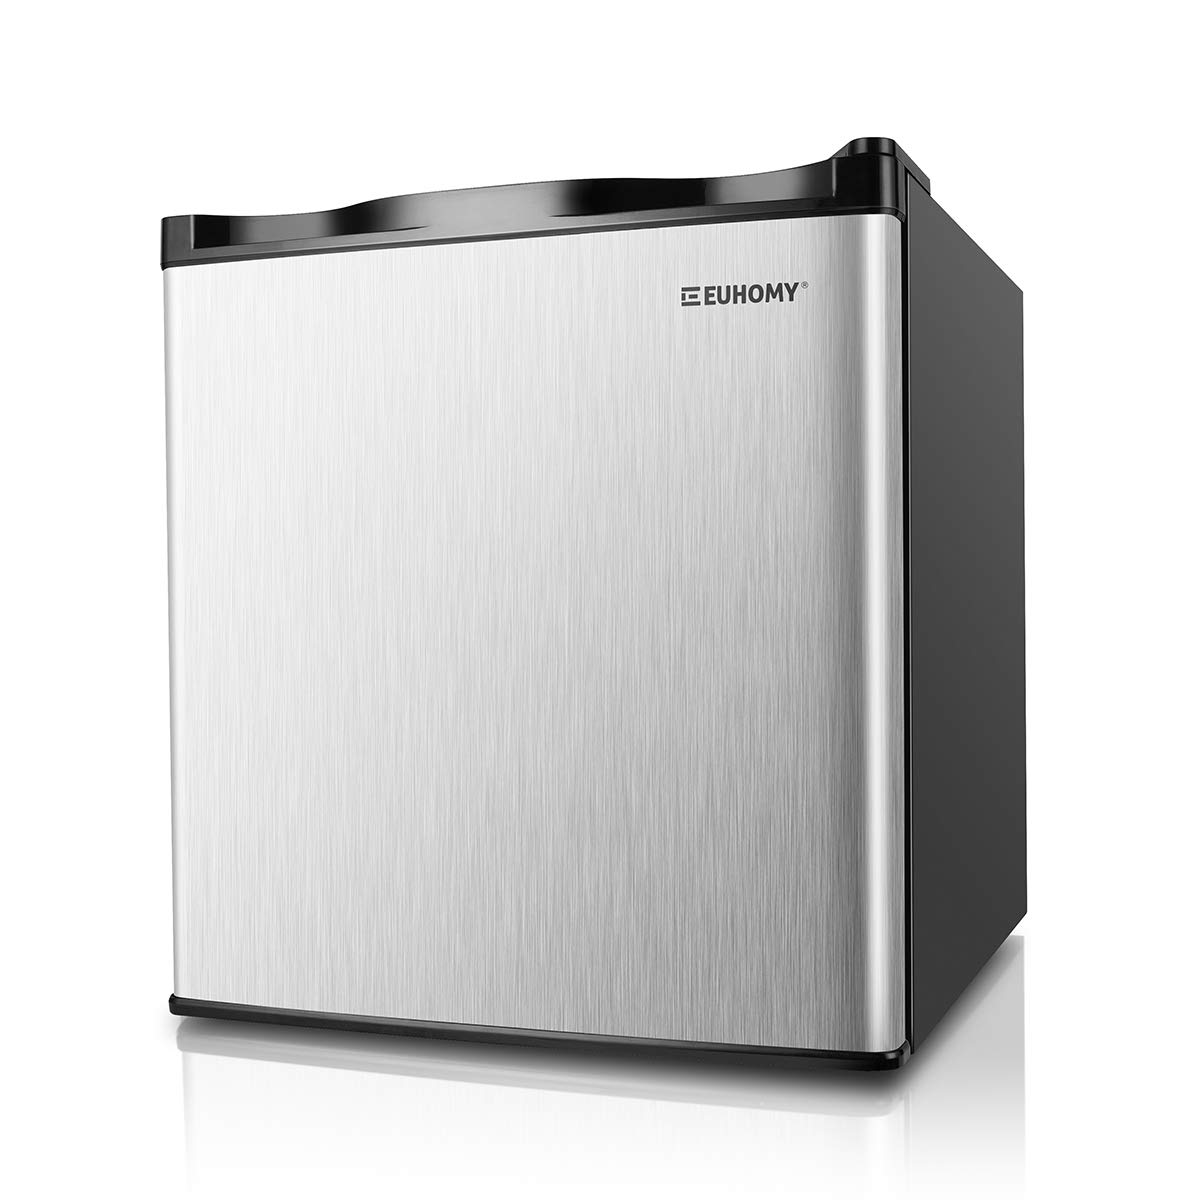 Euhomy Mini Freezer, Energy Star 1.1 Cubic Feet Single Door Countertop Compact Upright Freezer with Reversible Stainless Steel Door(Silver)